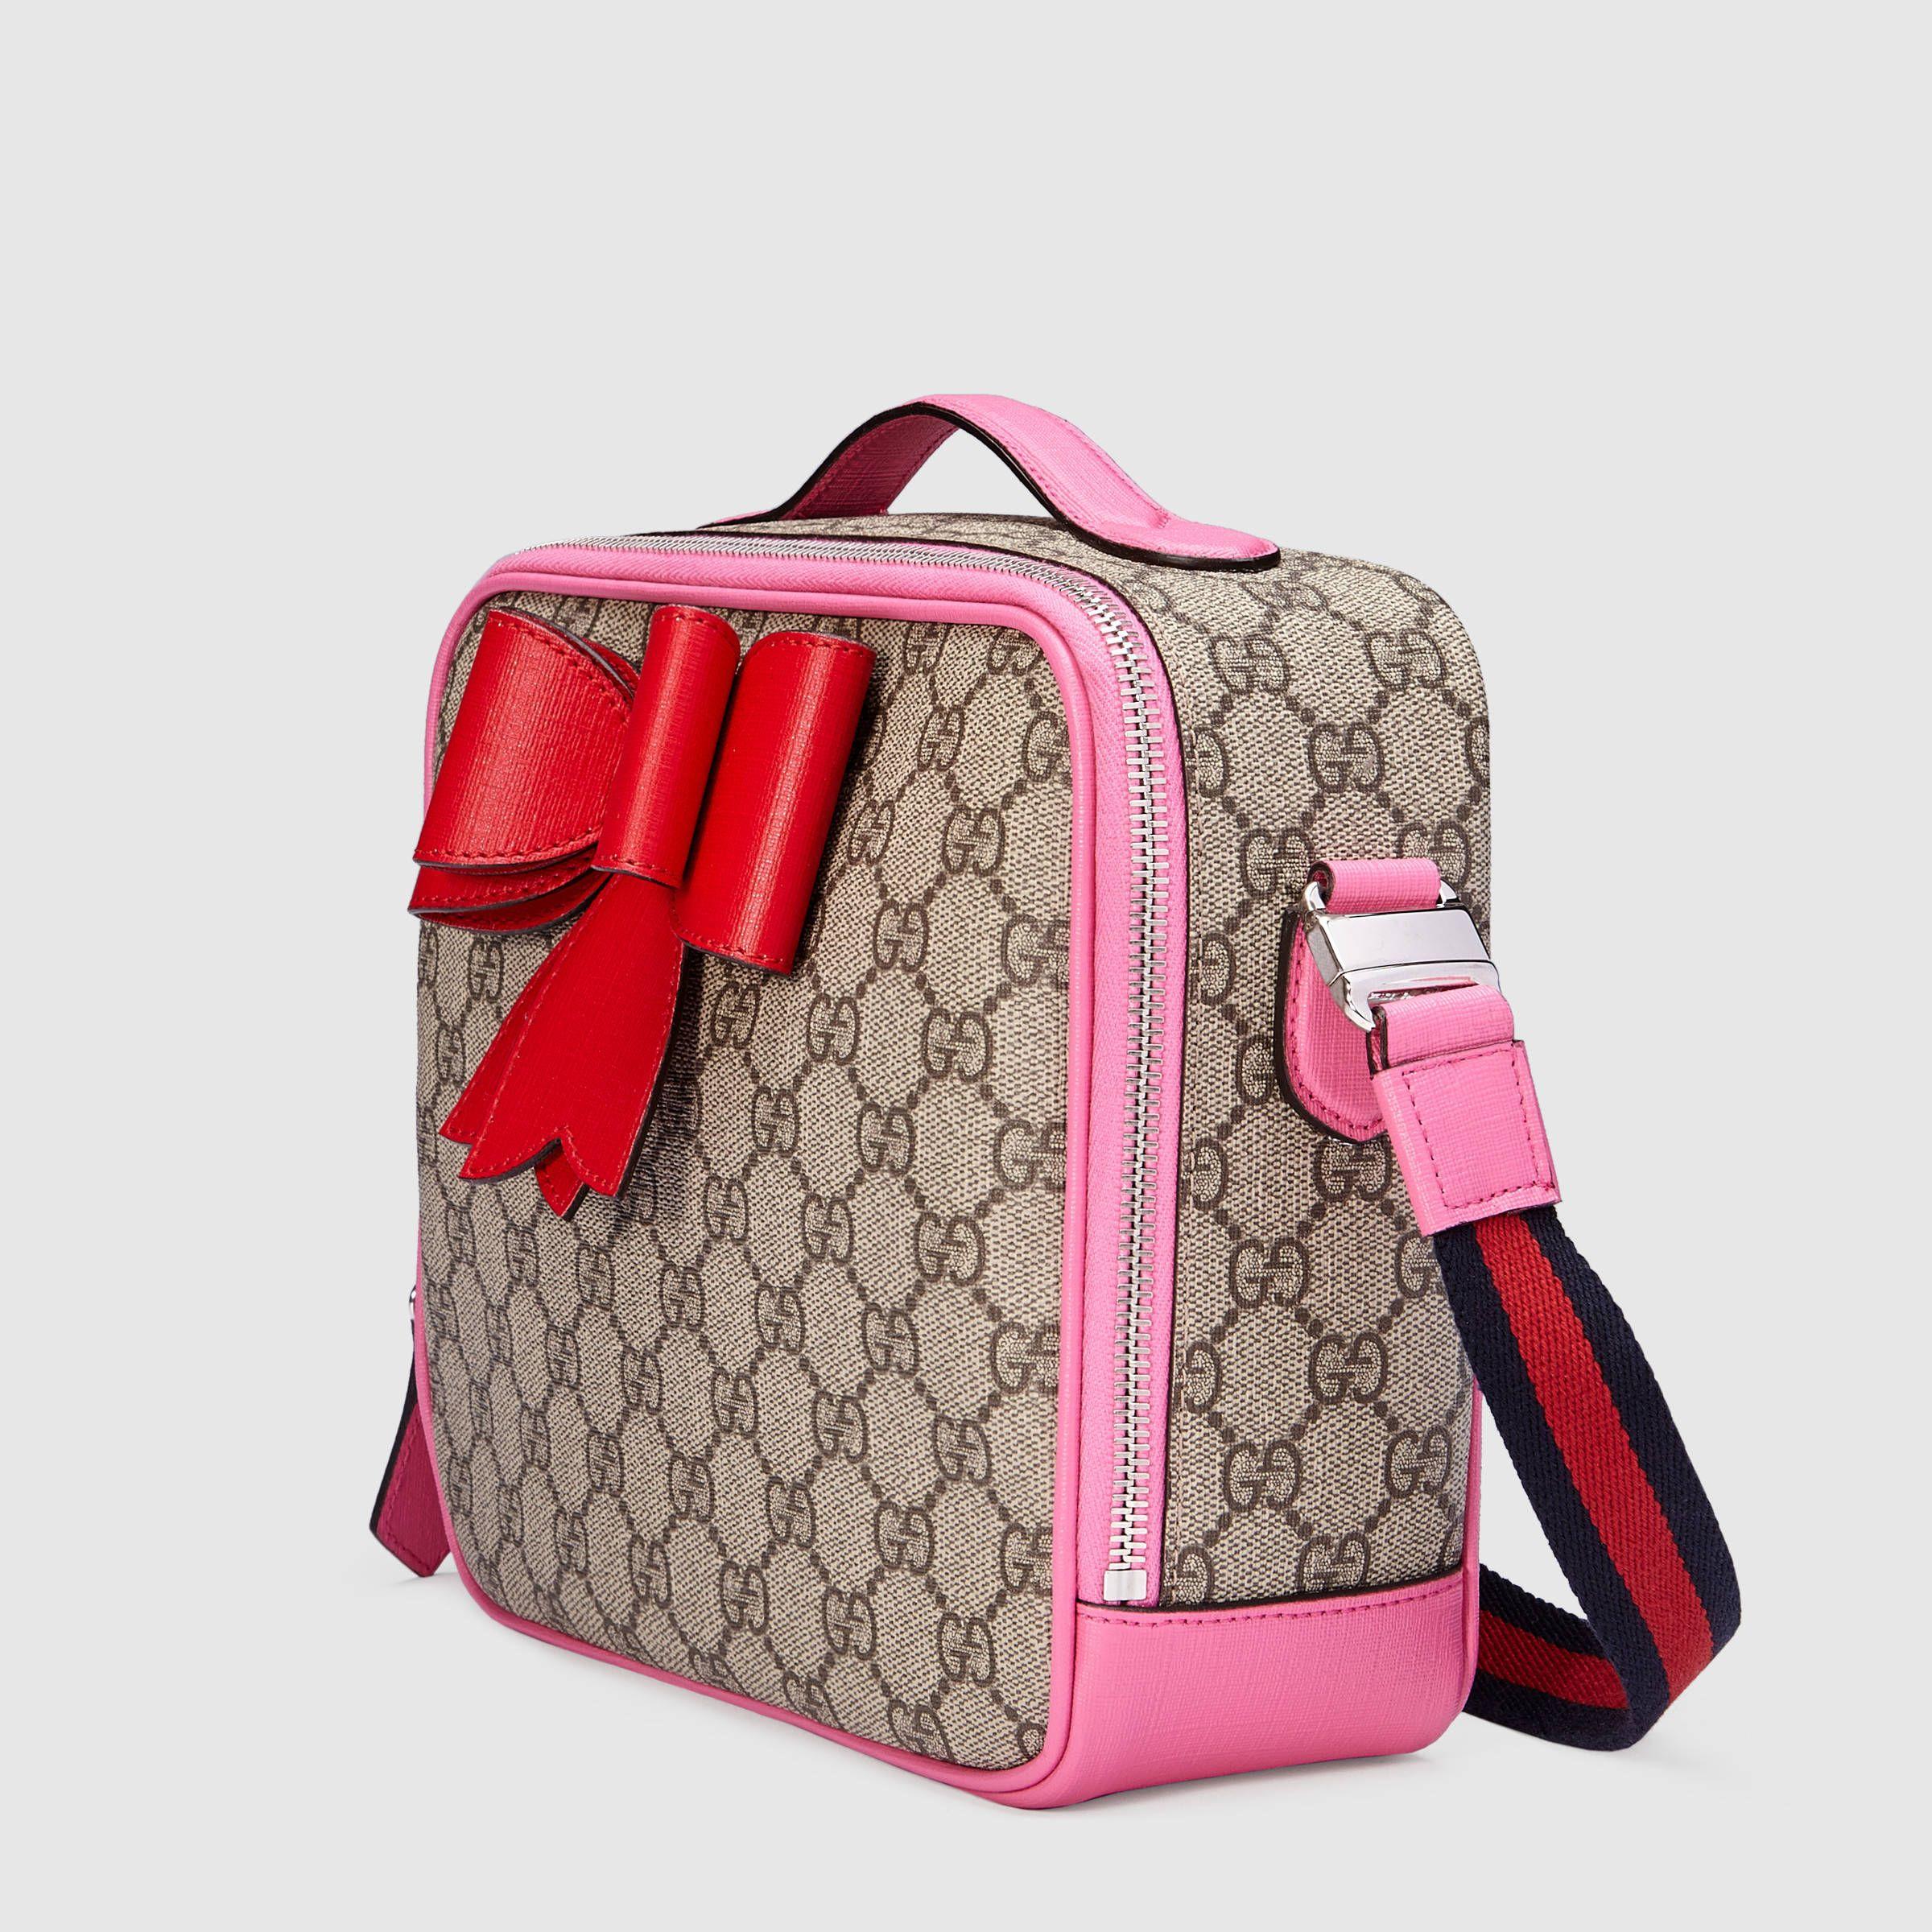 d6635d6558a Children s GG Supreme bow messenger - Gucci Children s Gifts 462500K8K6N8269